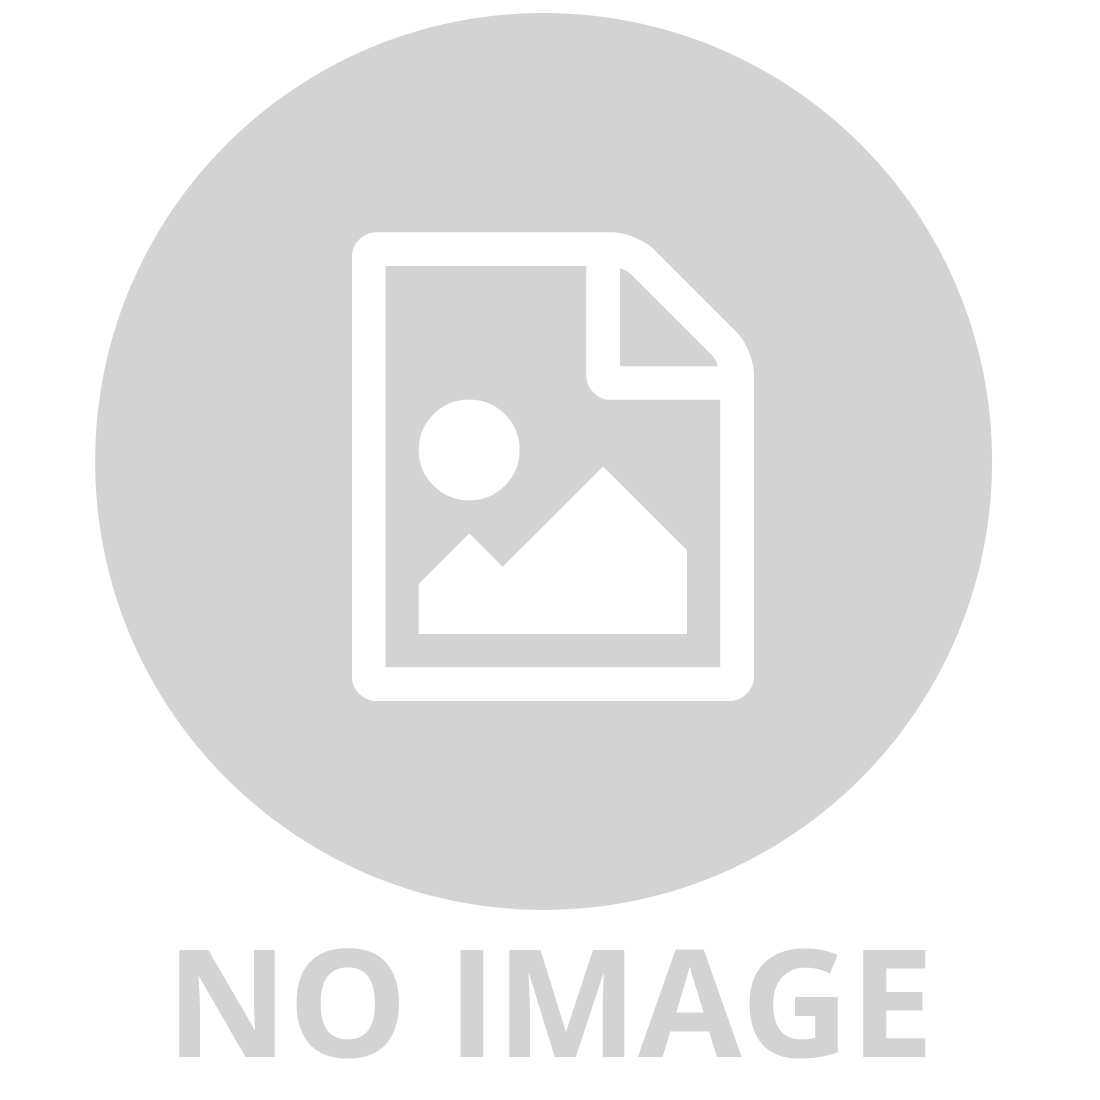 RUSCO RACING 1/43 DIGITAL SLOT CAR BLUE MINI